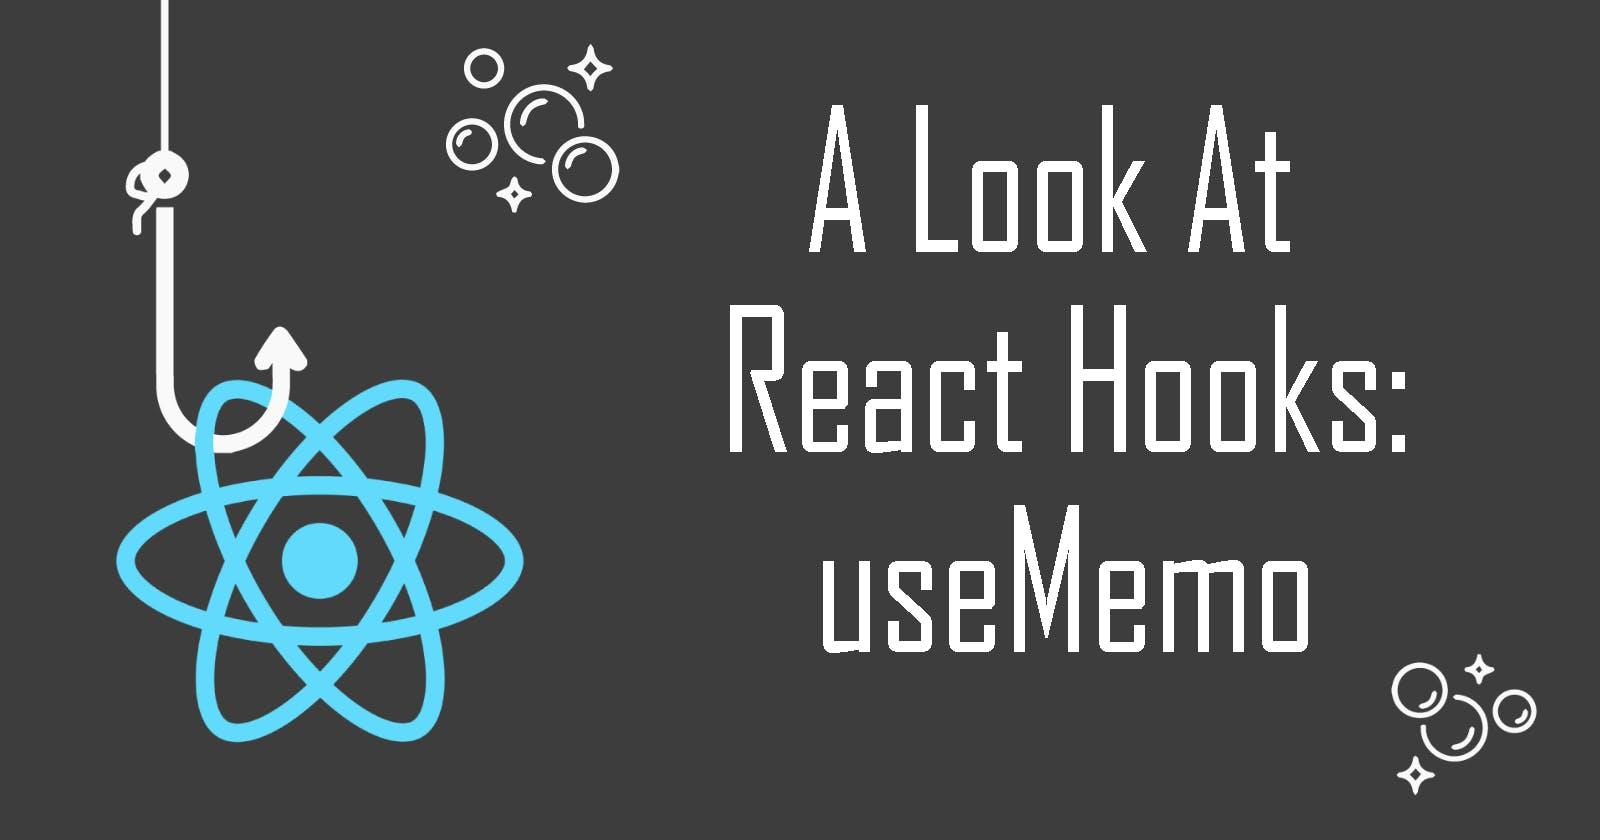 A Look at React Hooks: useMemo